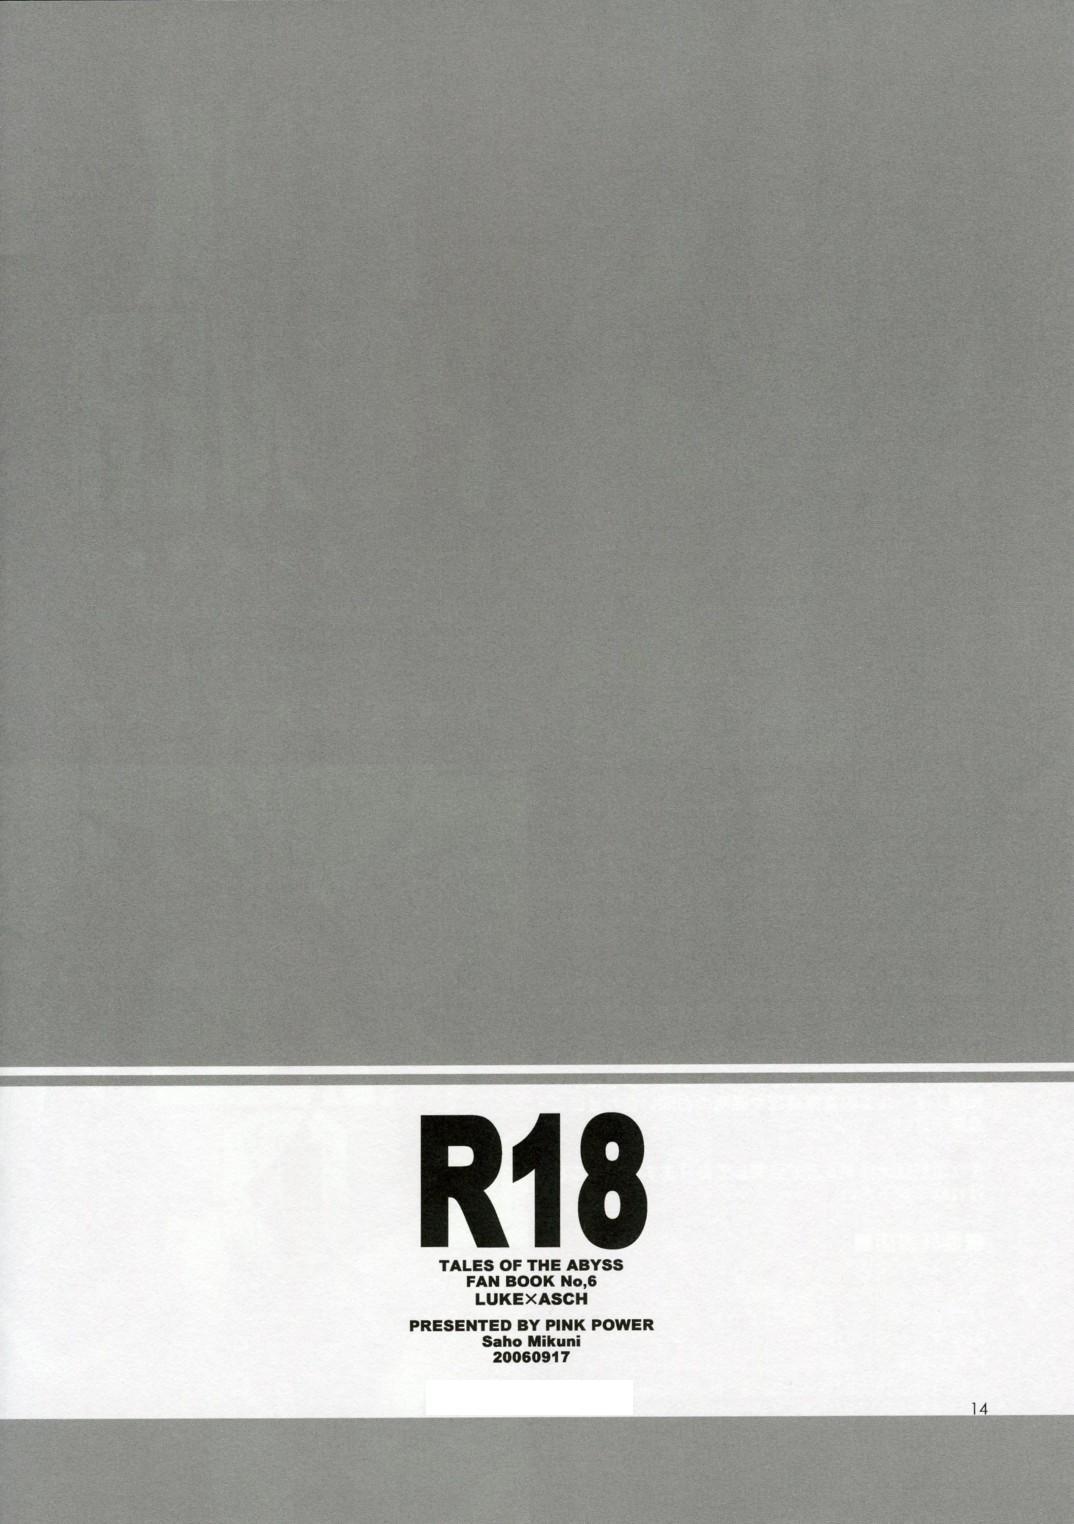 R18 12